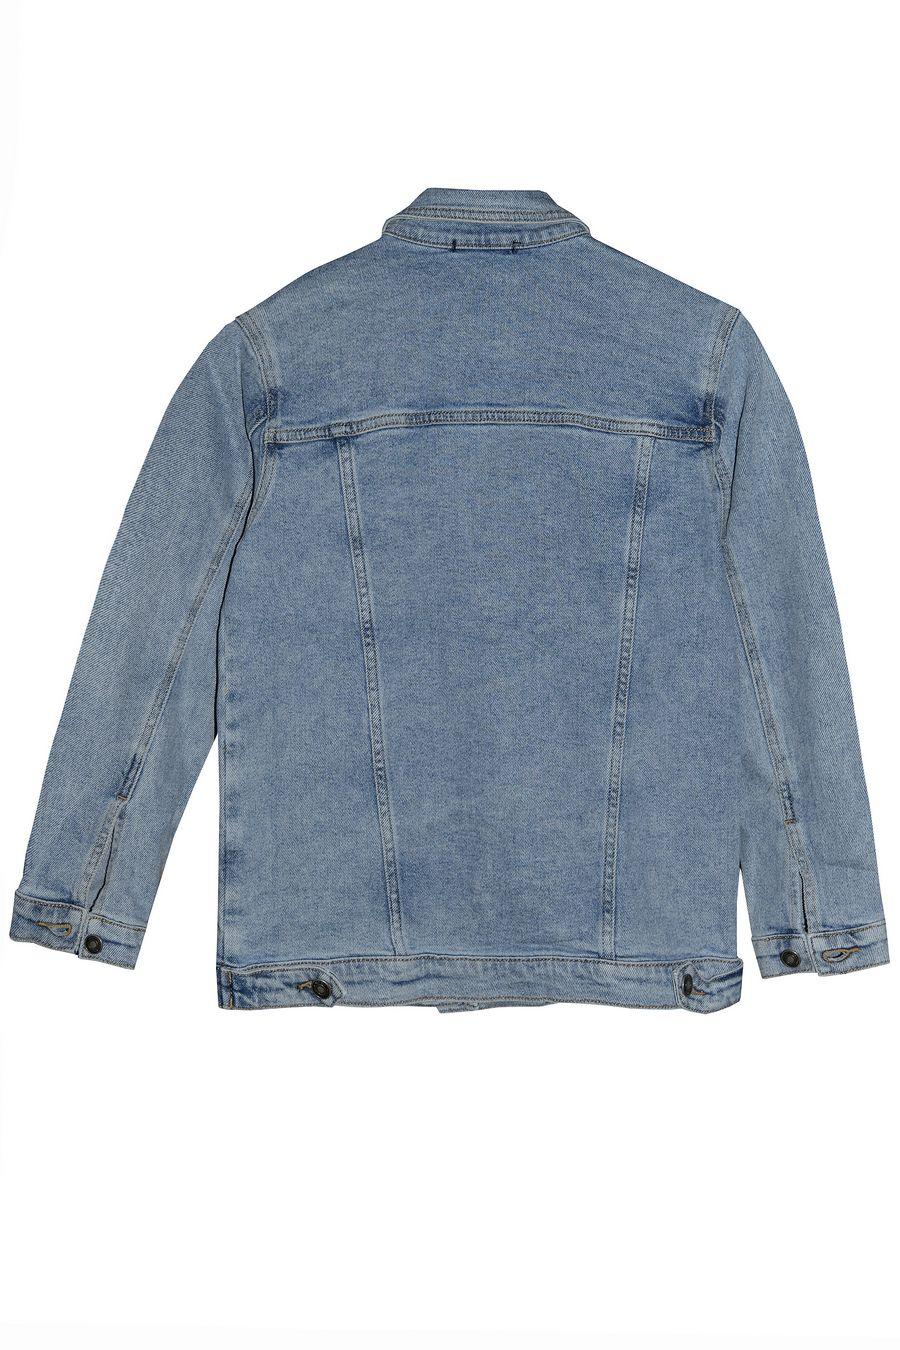 Куртка женская Blue Coco 127 - фото 2